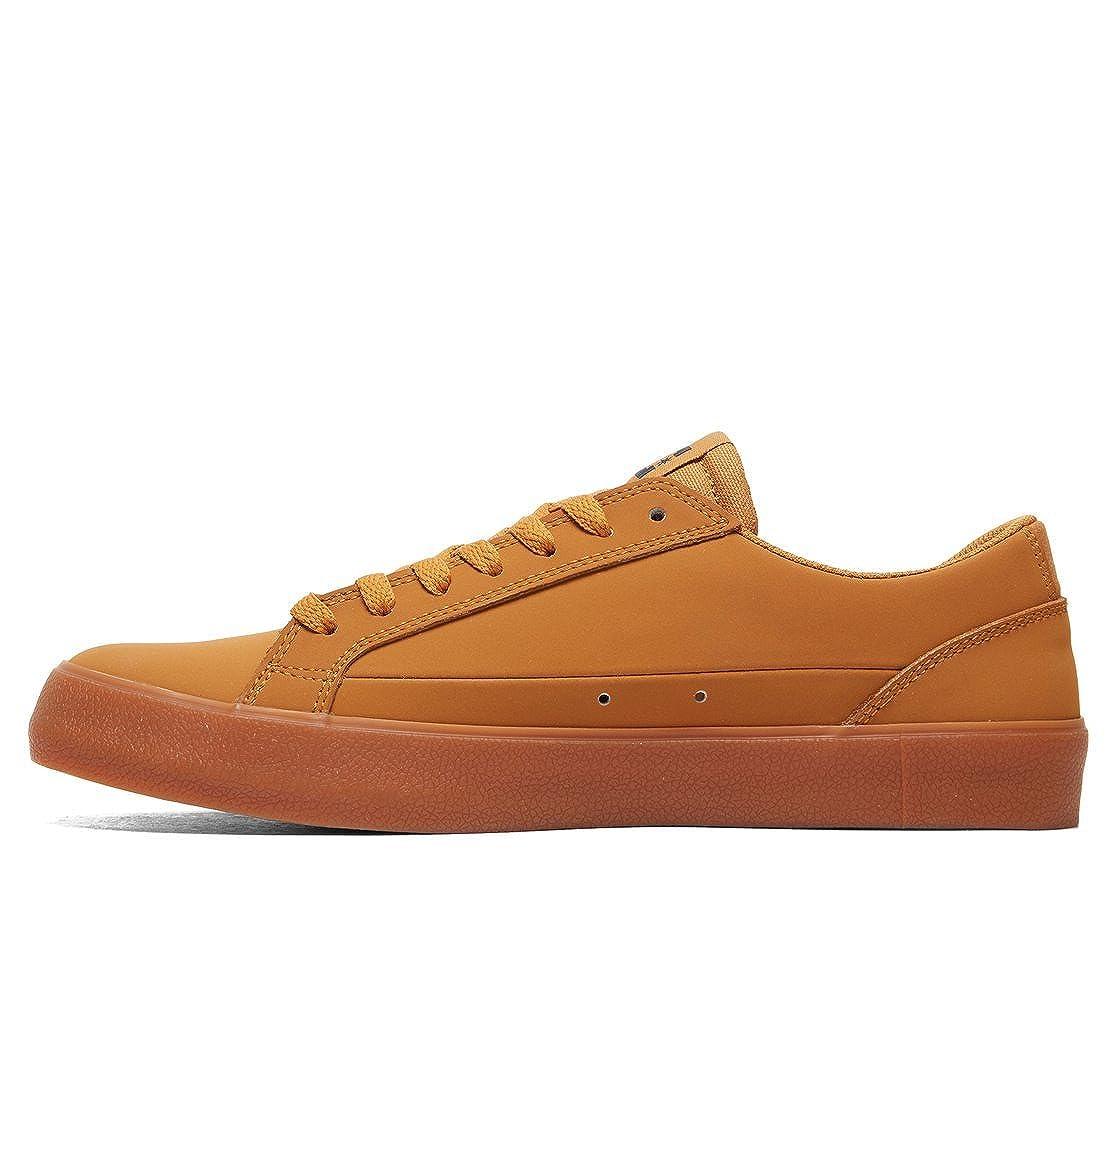 DC Shoes Lynnfield, Chaussures de Skateboard Homme, Marron (Wheat We9), 40 EU